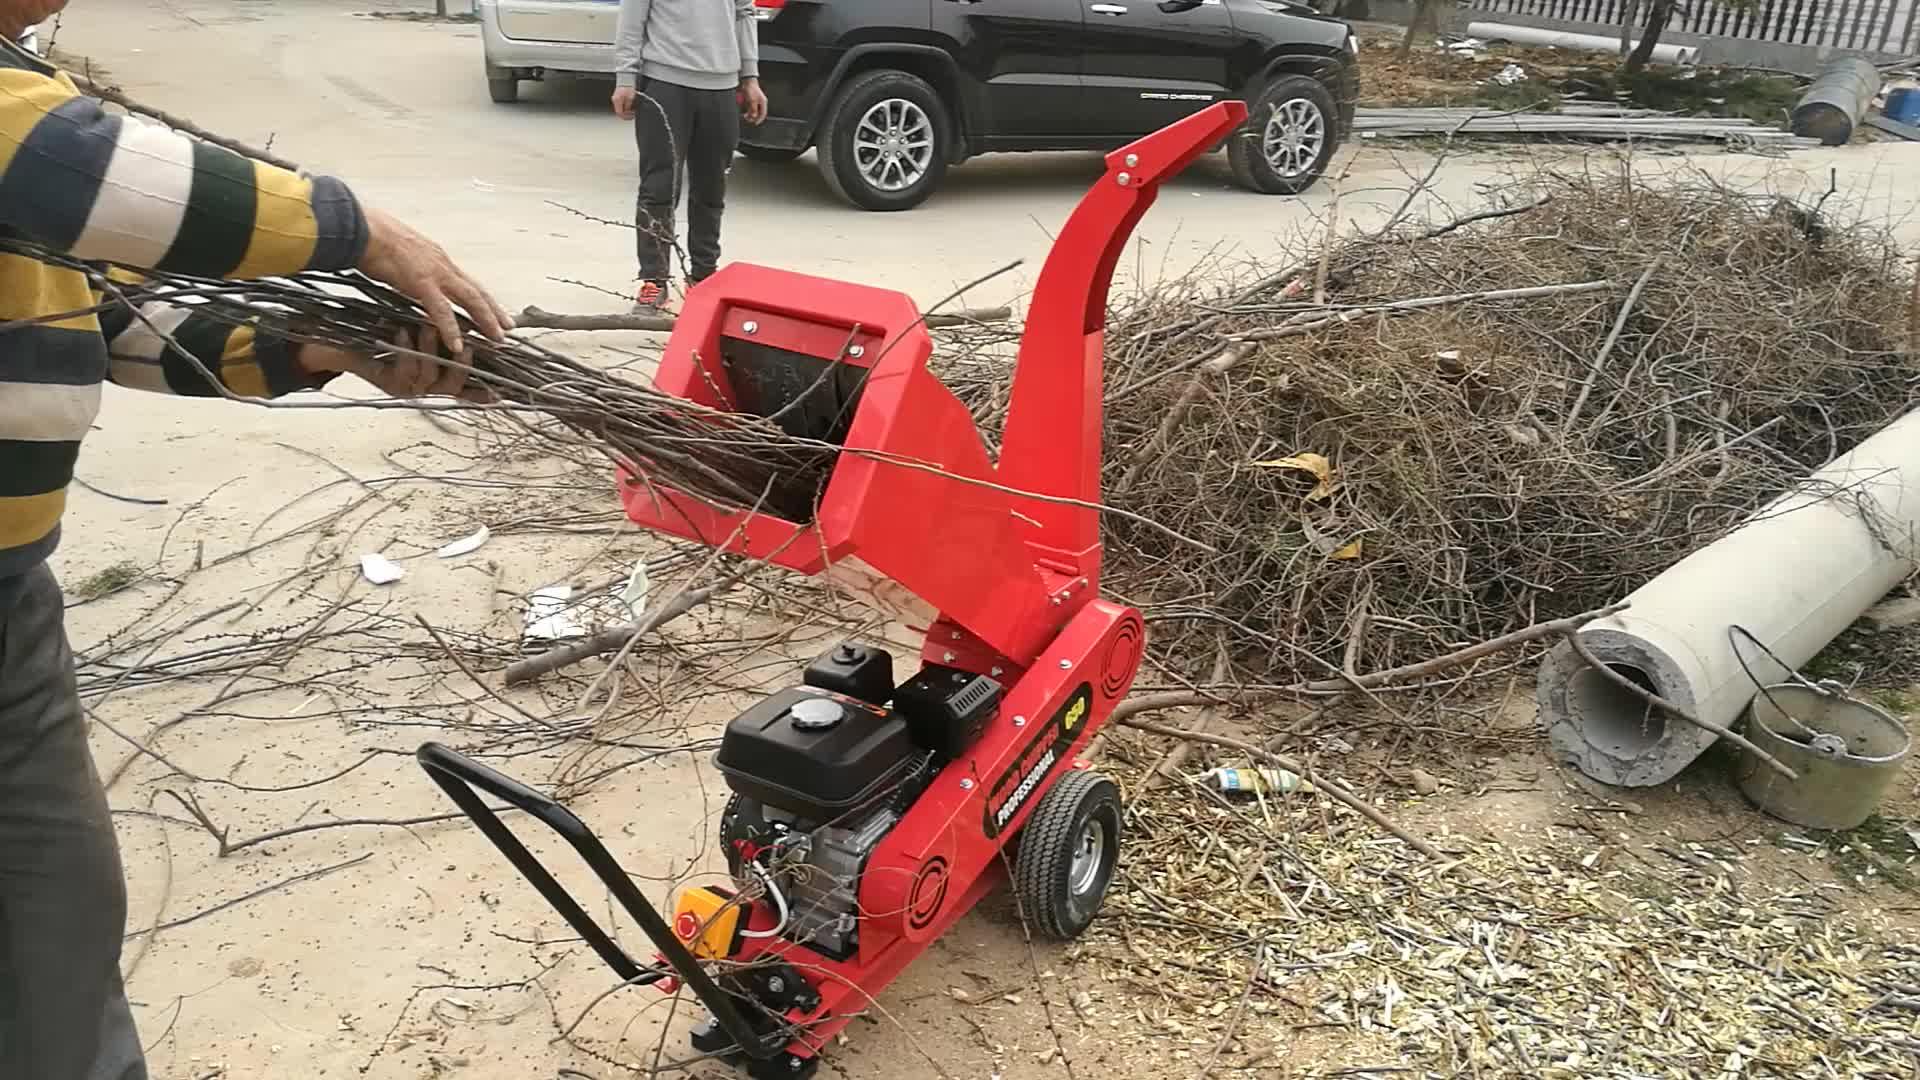 NEWEEK petrol 9hp engine fresh tree branch chipping machine twig chipper for organic fertilizer